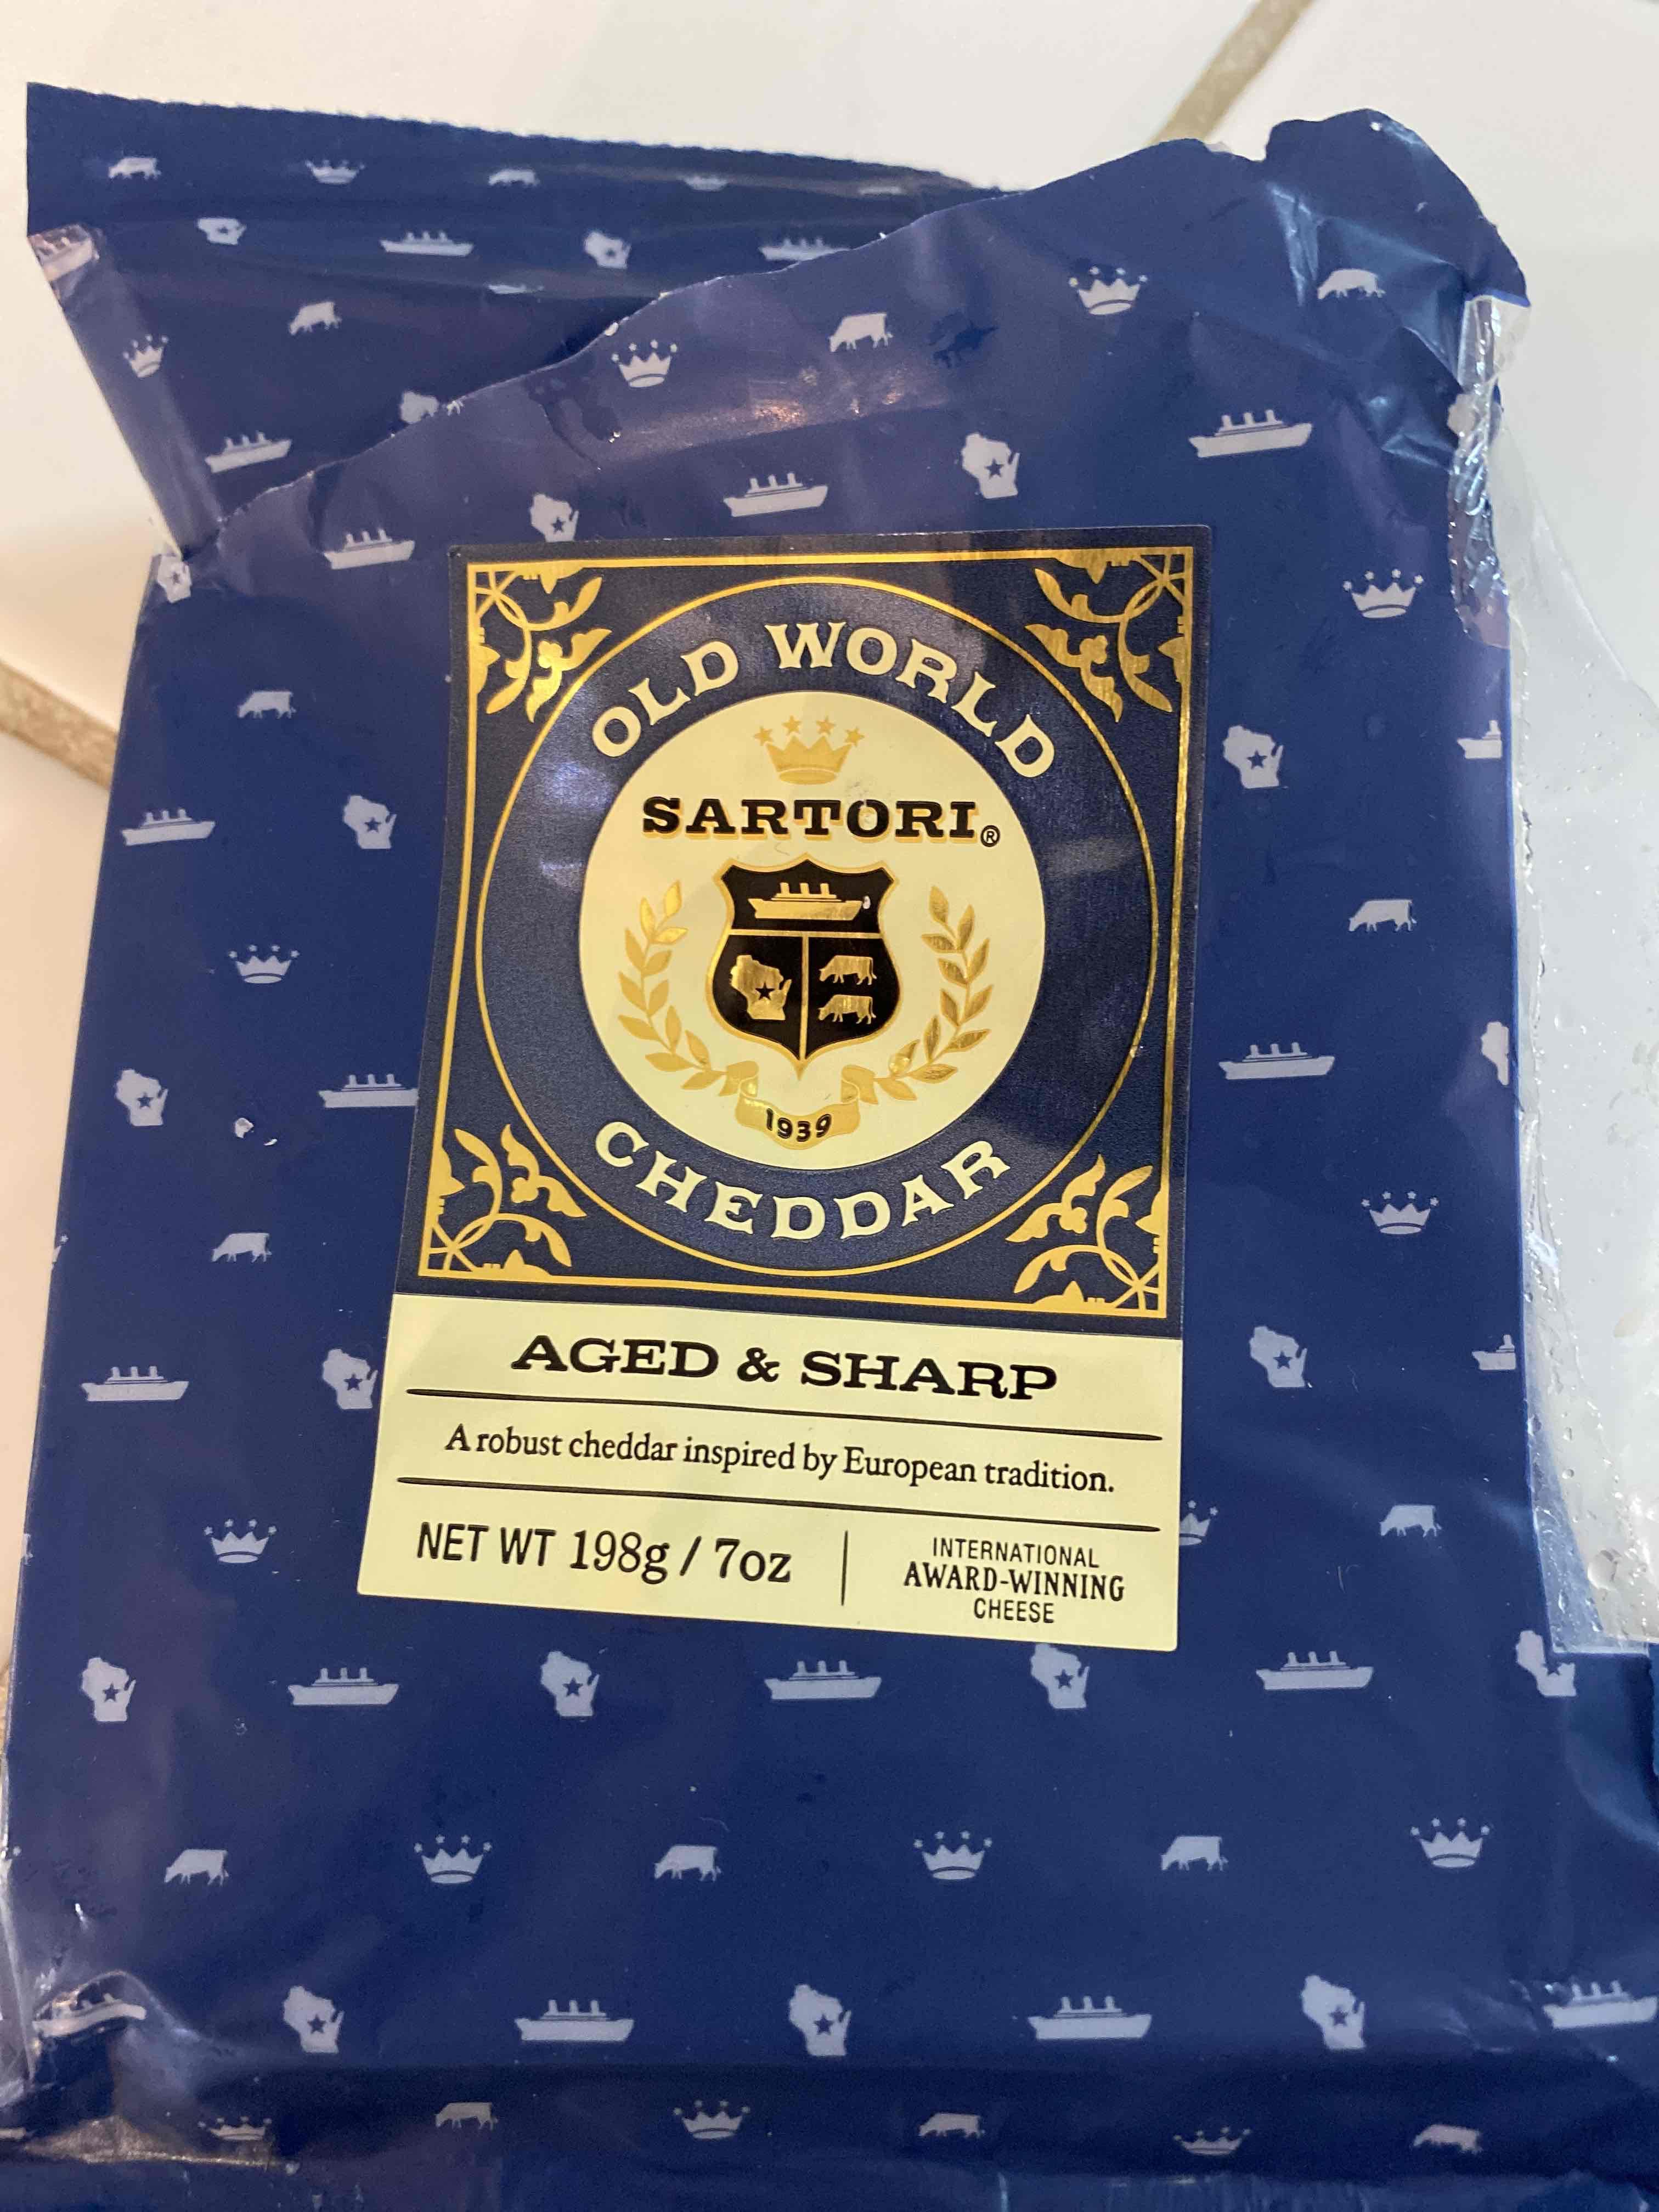 Sartori Old World Cheddar